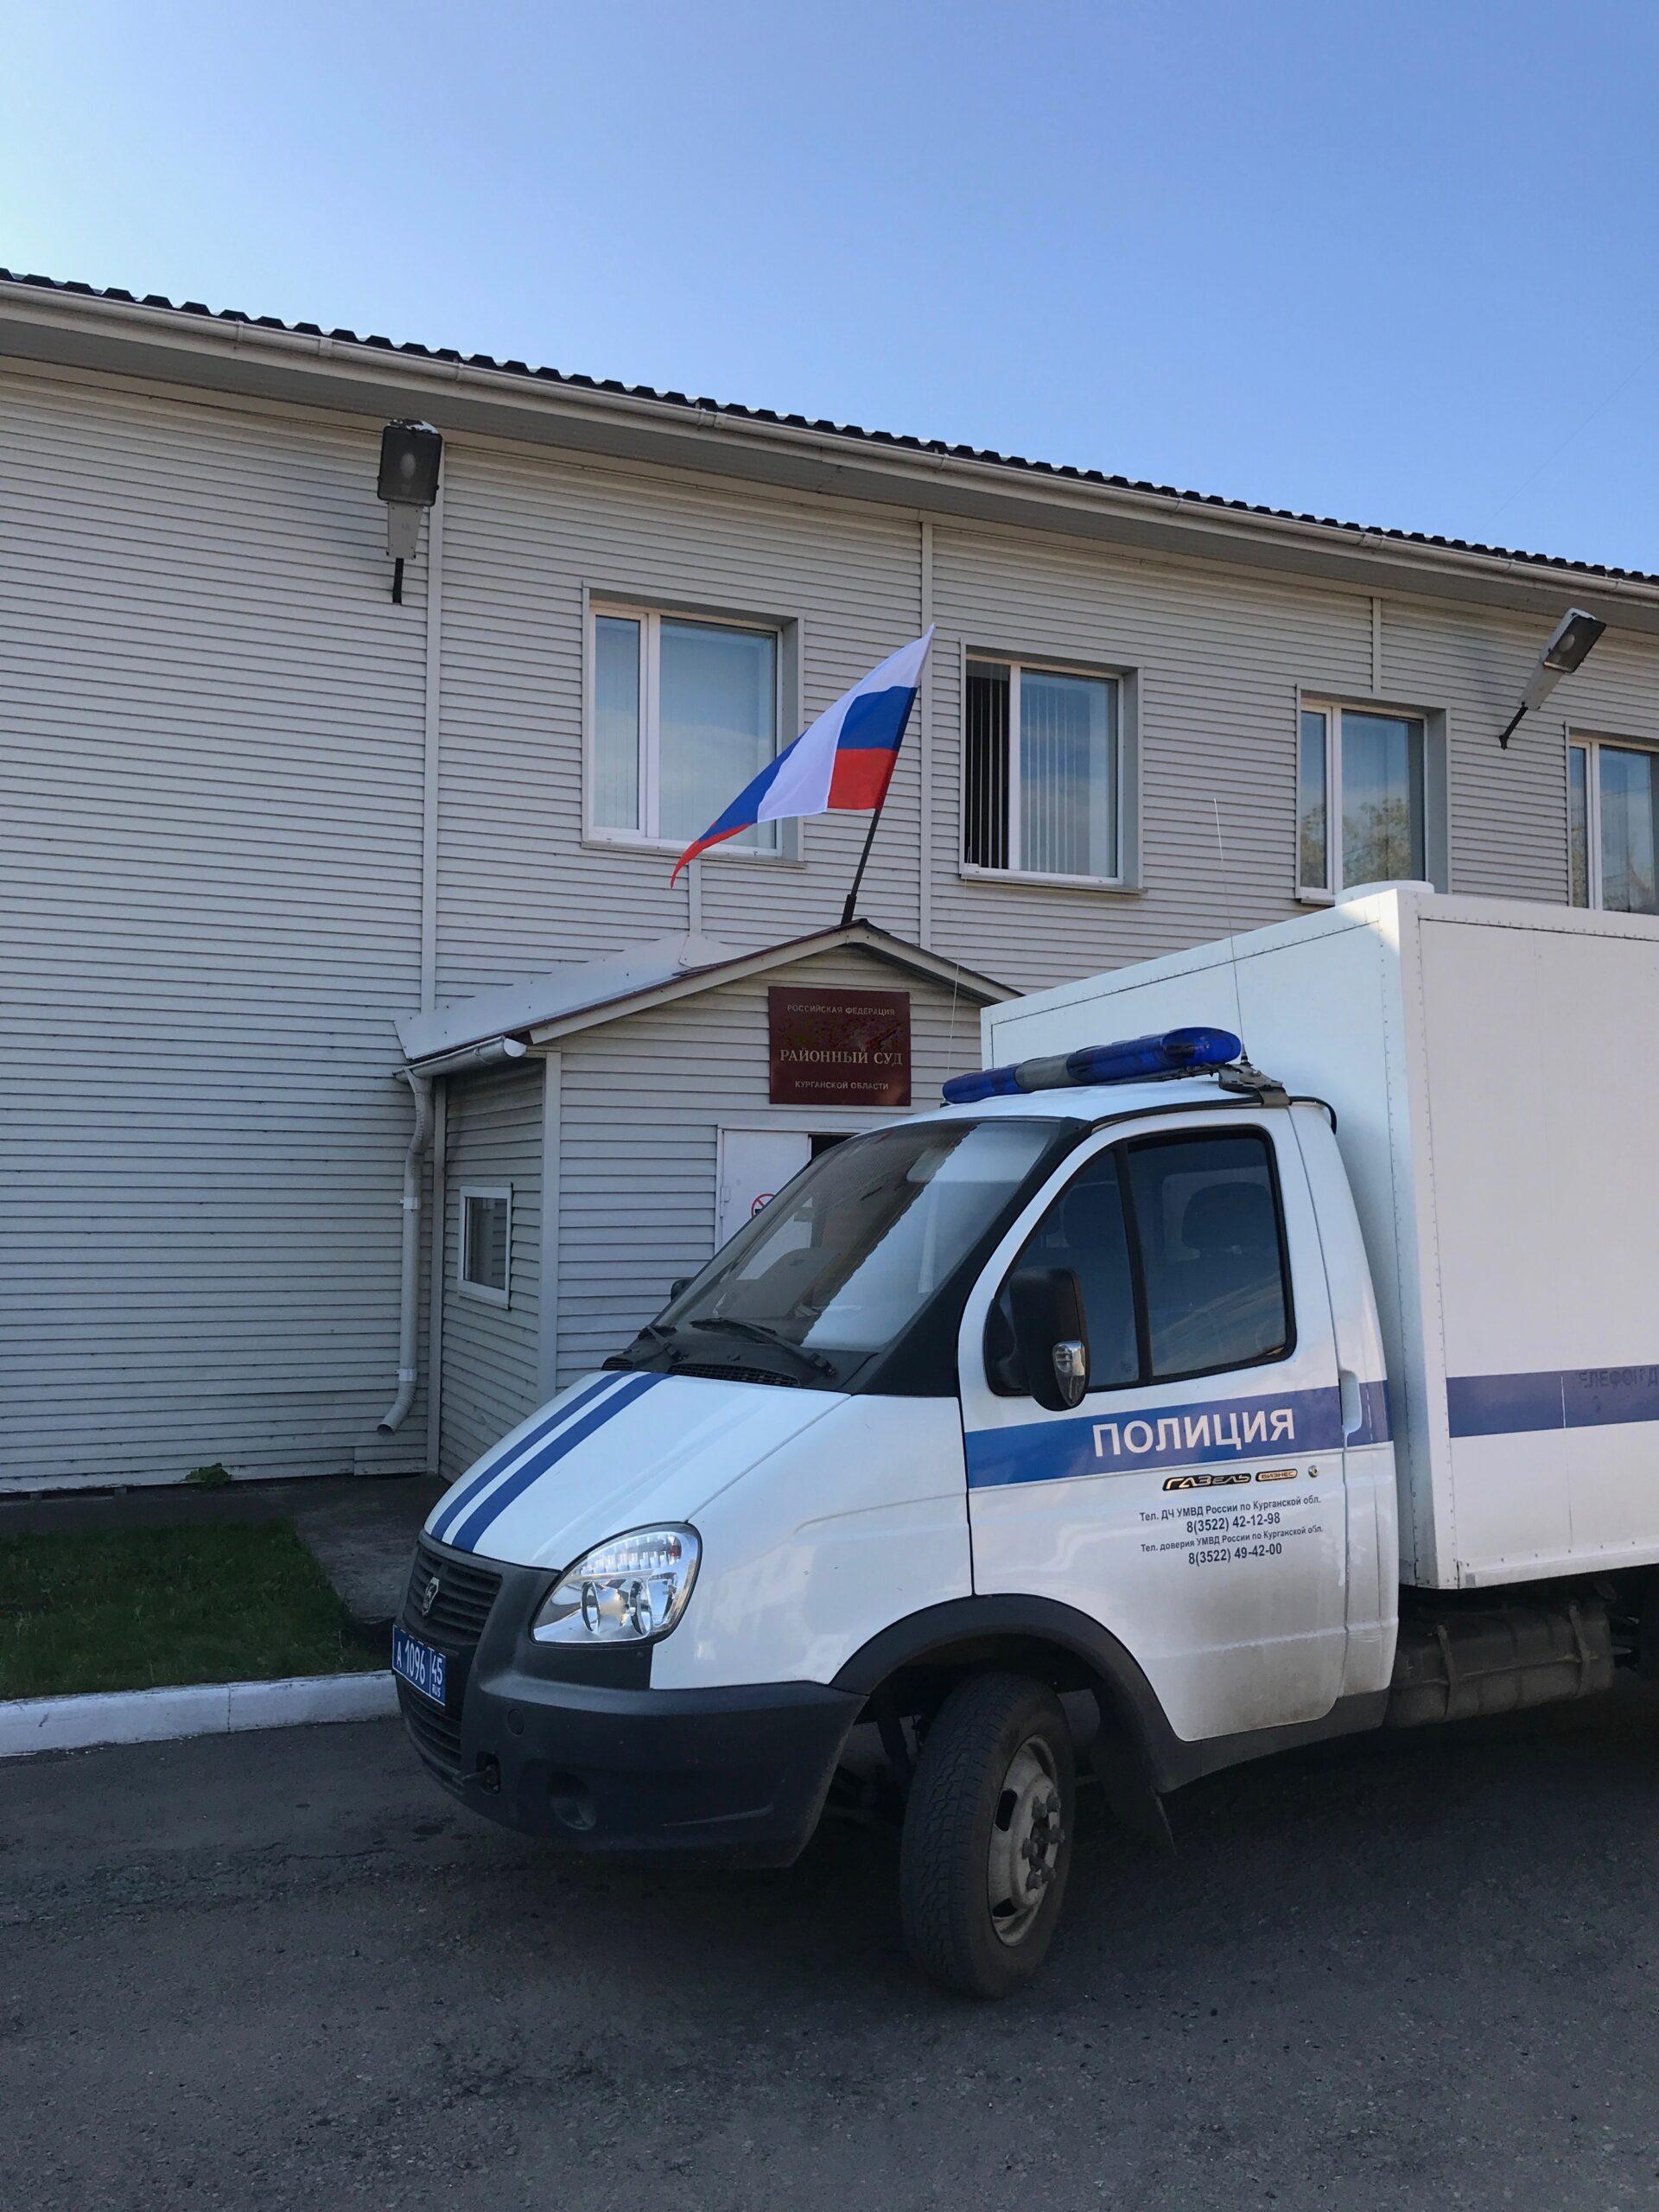 Сумасшедший Traffic скромного адвоката:суд, допрос, Екатеринбург.